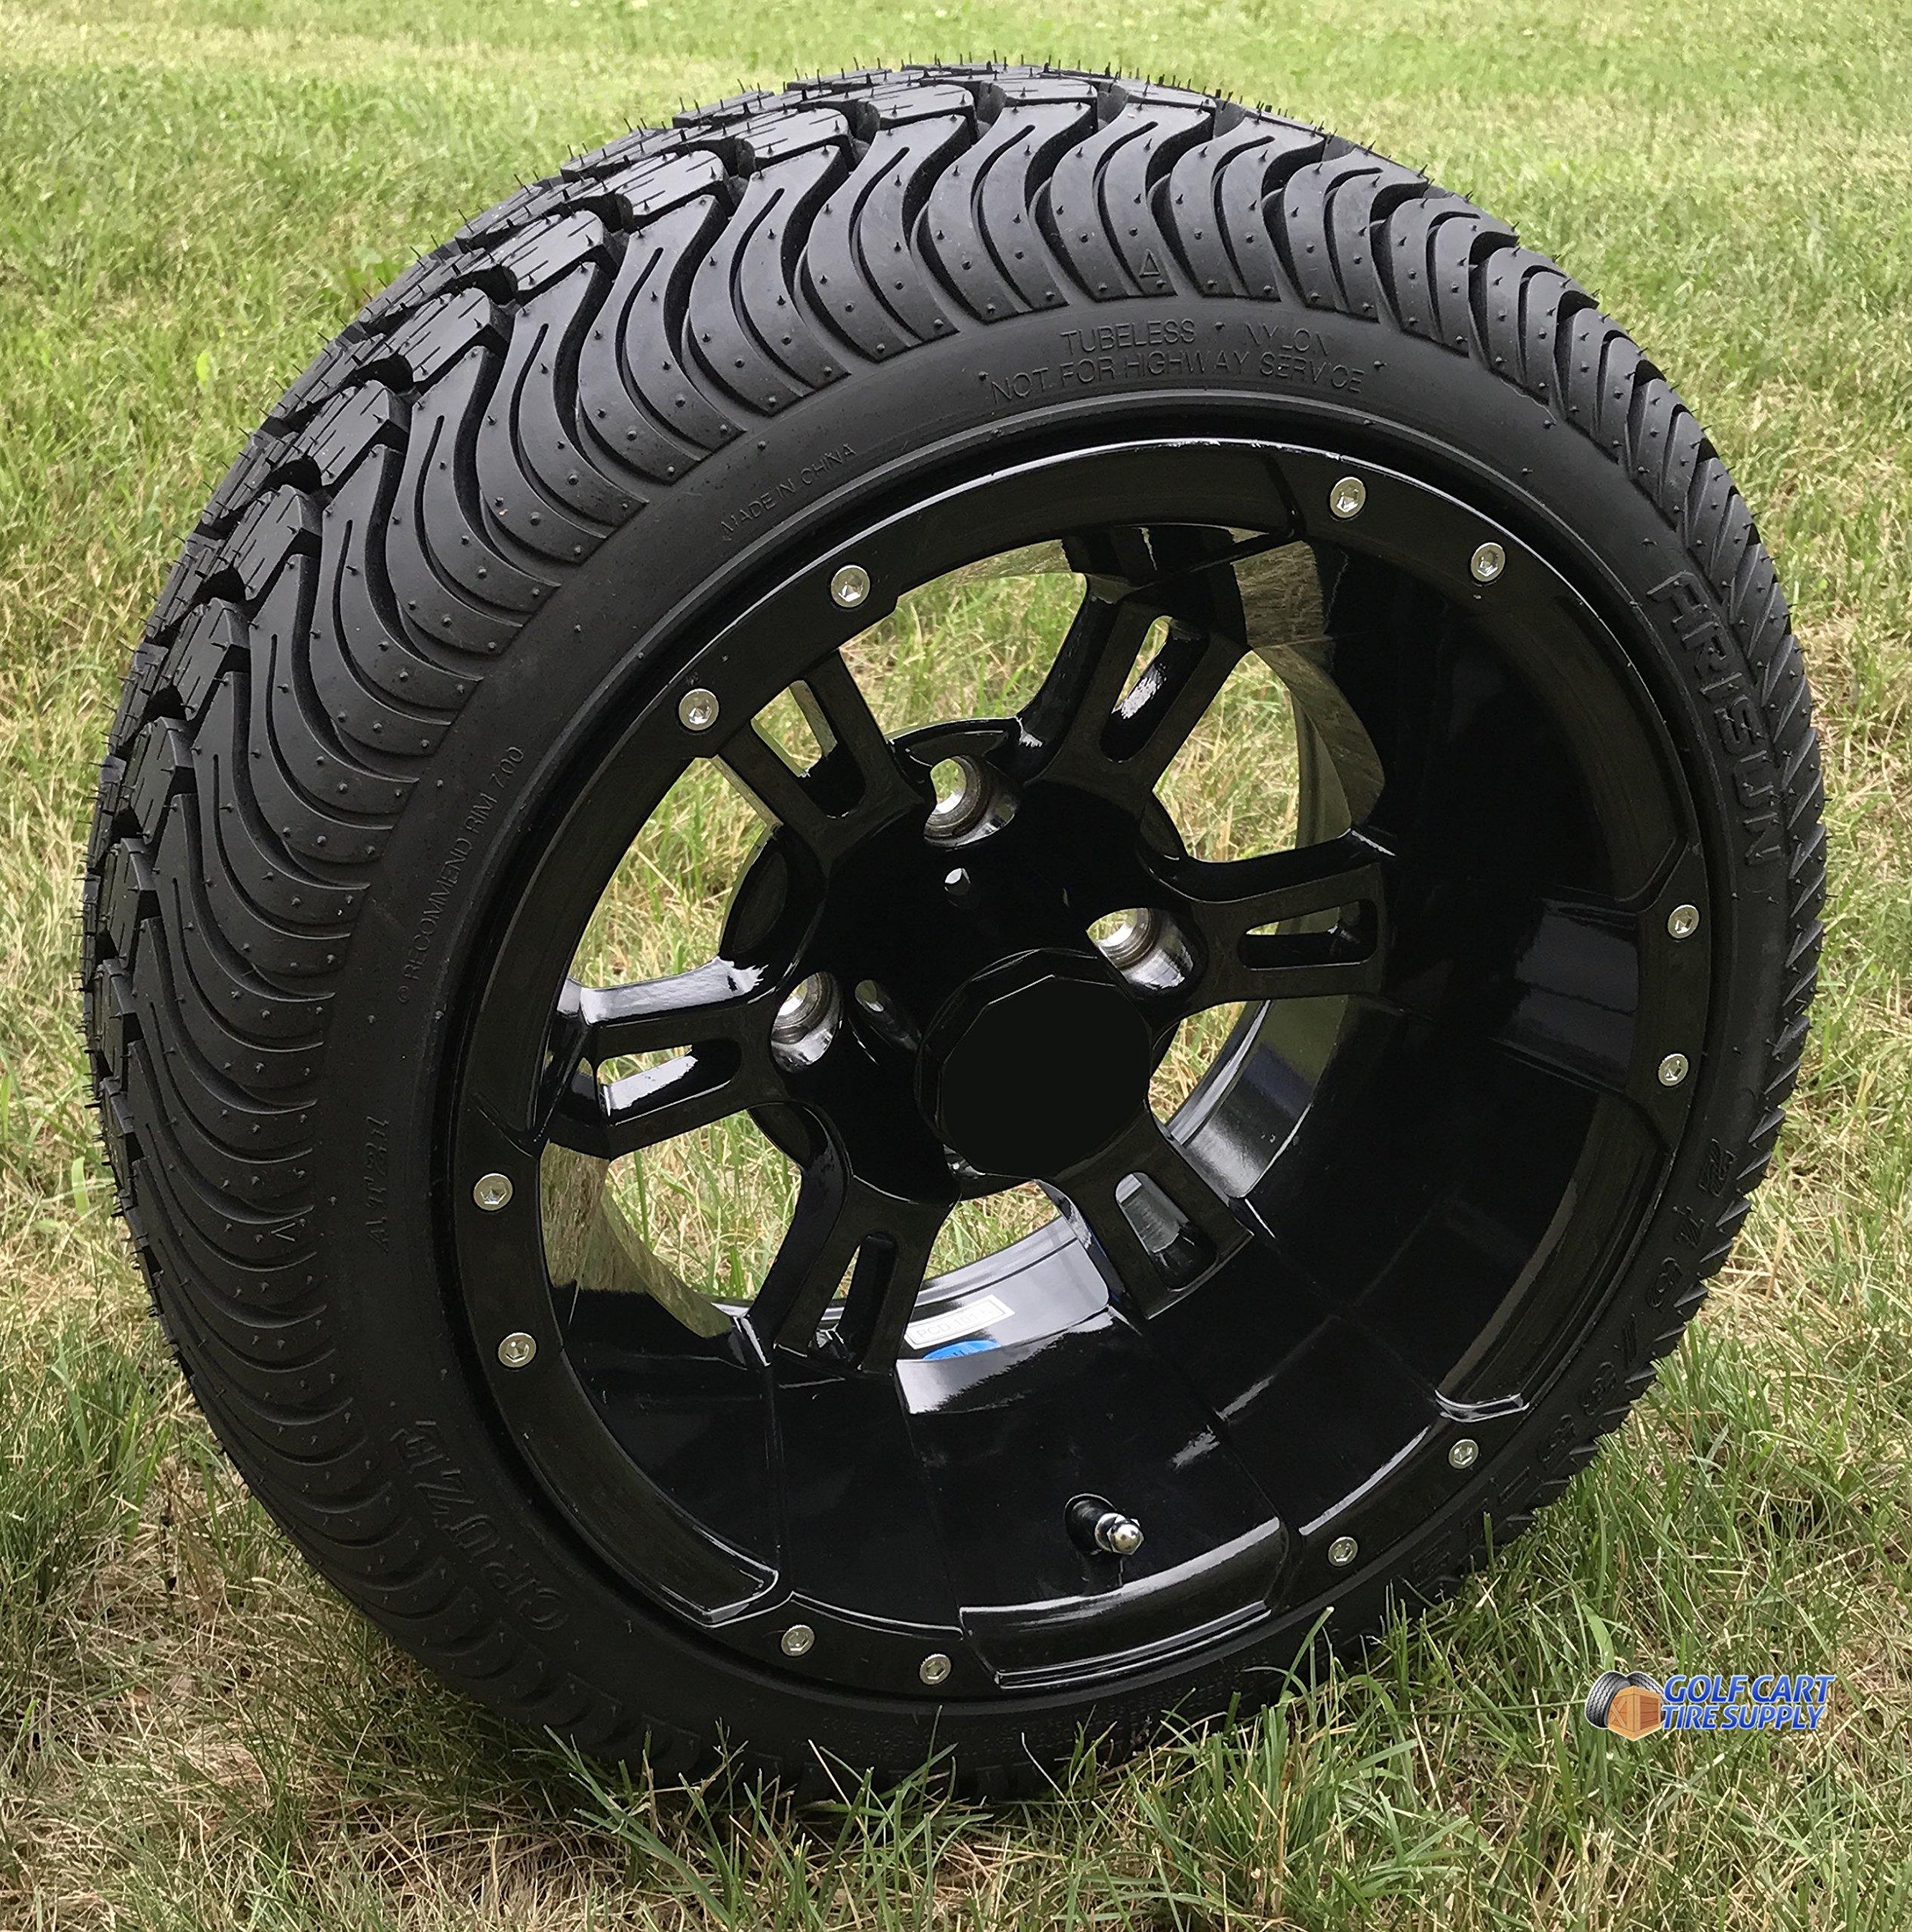 12'' RUCKUS Gloss BLACK Wheels and 215/35-12'' DOT Low Profile Tires Combo - Set of 4 (METRIC LUGS 12MMx1.25 (Yamaha, Star))